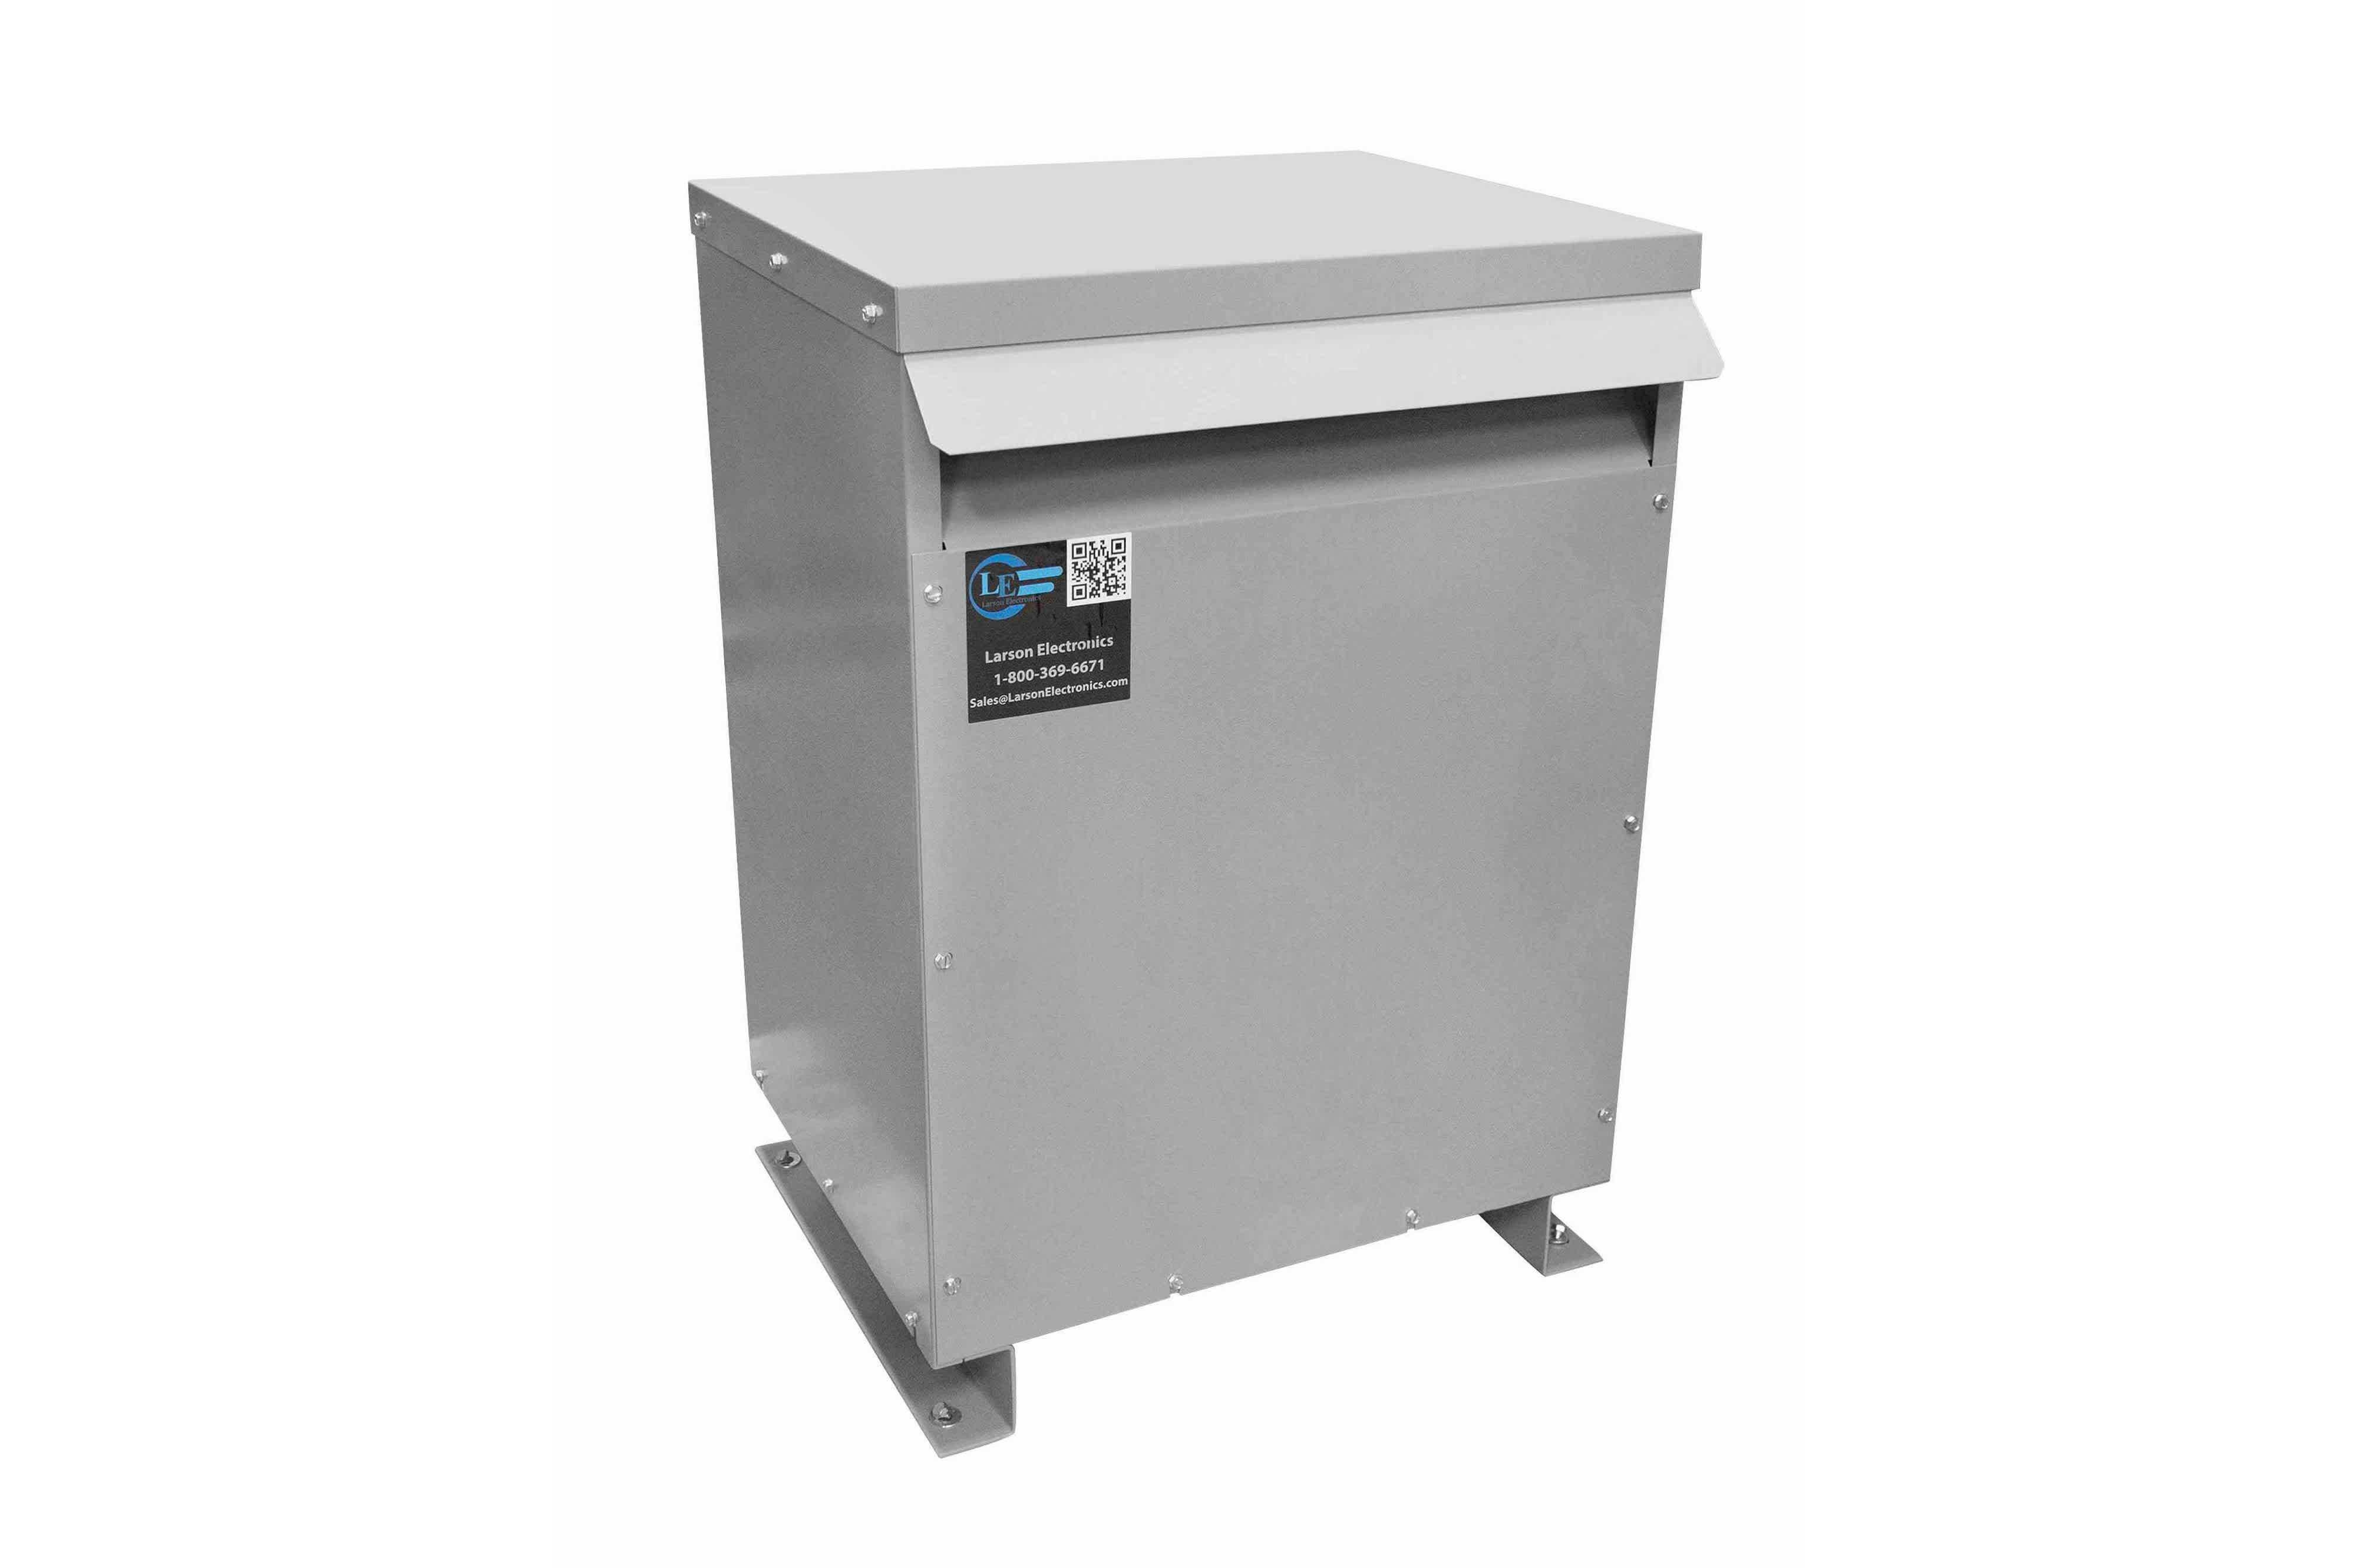 50 kVA 3PH Isolation Transformer, 240V Wye Primary, 400V Delta Secondary, N3R, Ventilated, 60 Hz